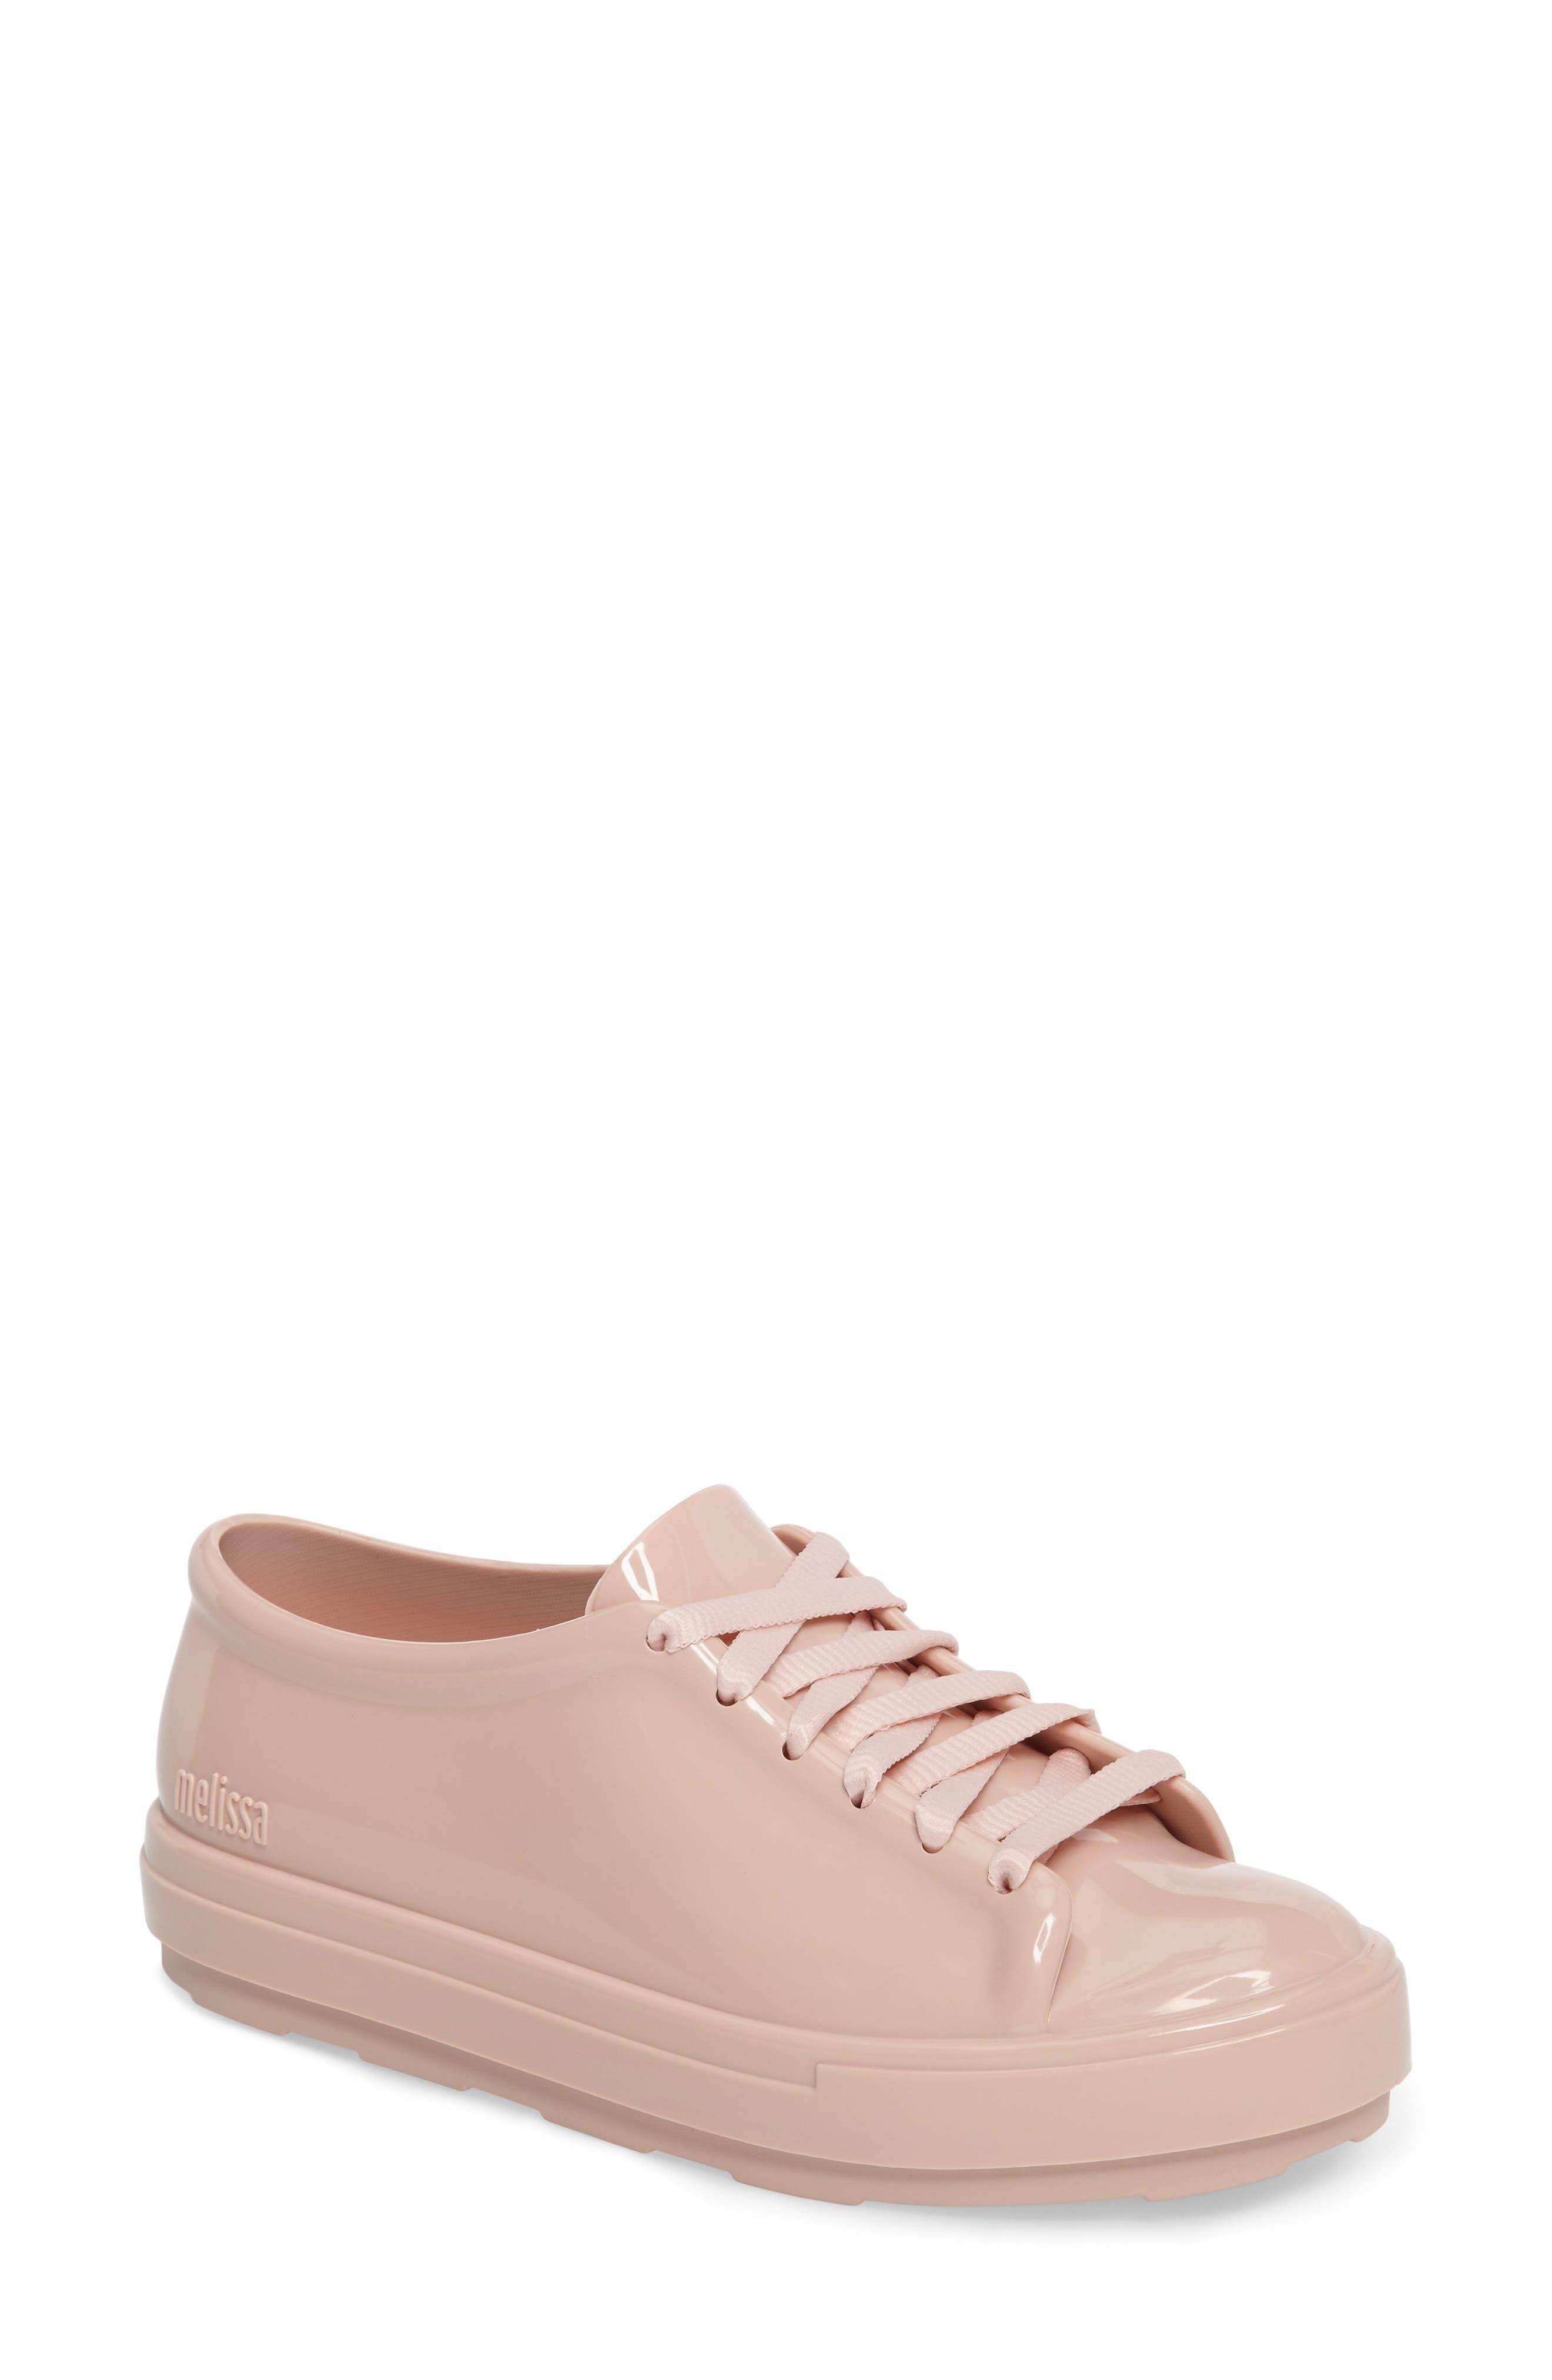 Be Sneaker,                             Main thumbnail 1, color,                             Pink